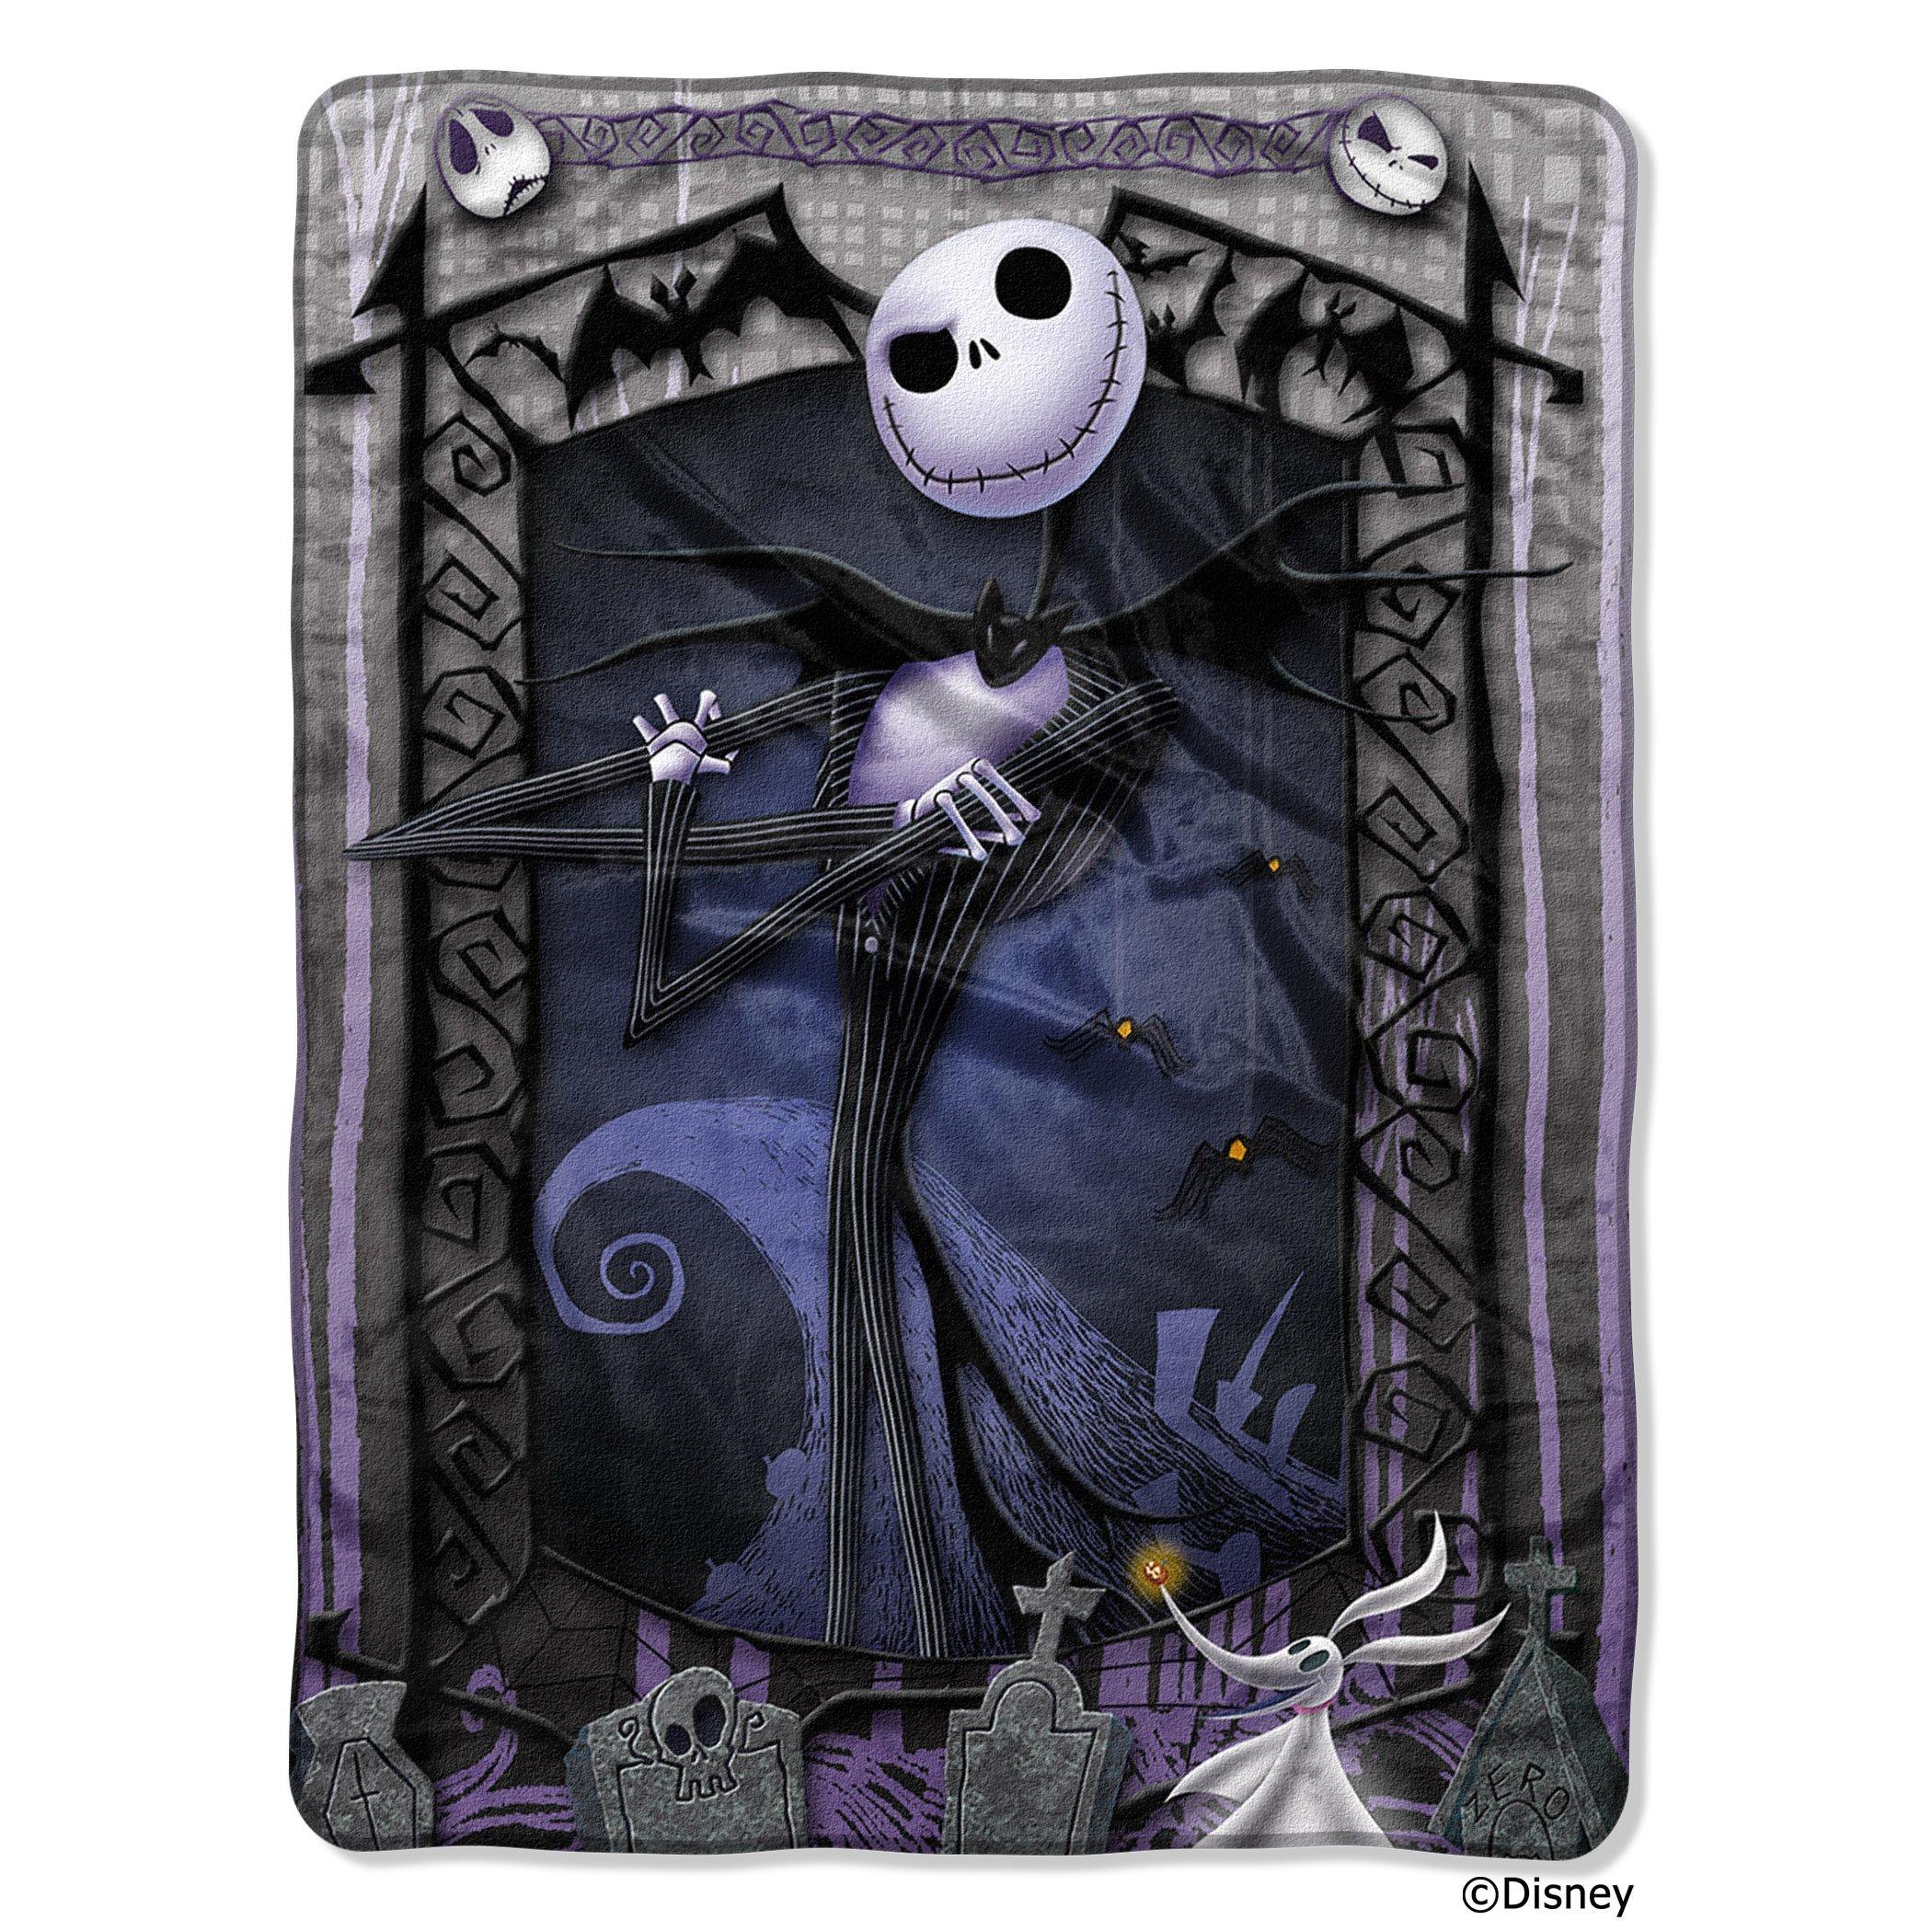 Northwest Disney The Nightmare Before Christmas, Jack's Graveyard 46'' x 60'' Micro Raschel Throw Blanket by Northwest